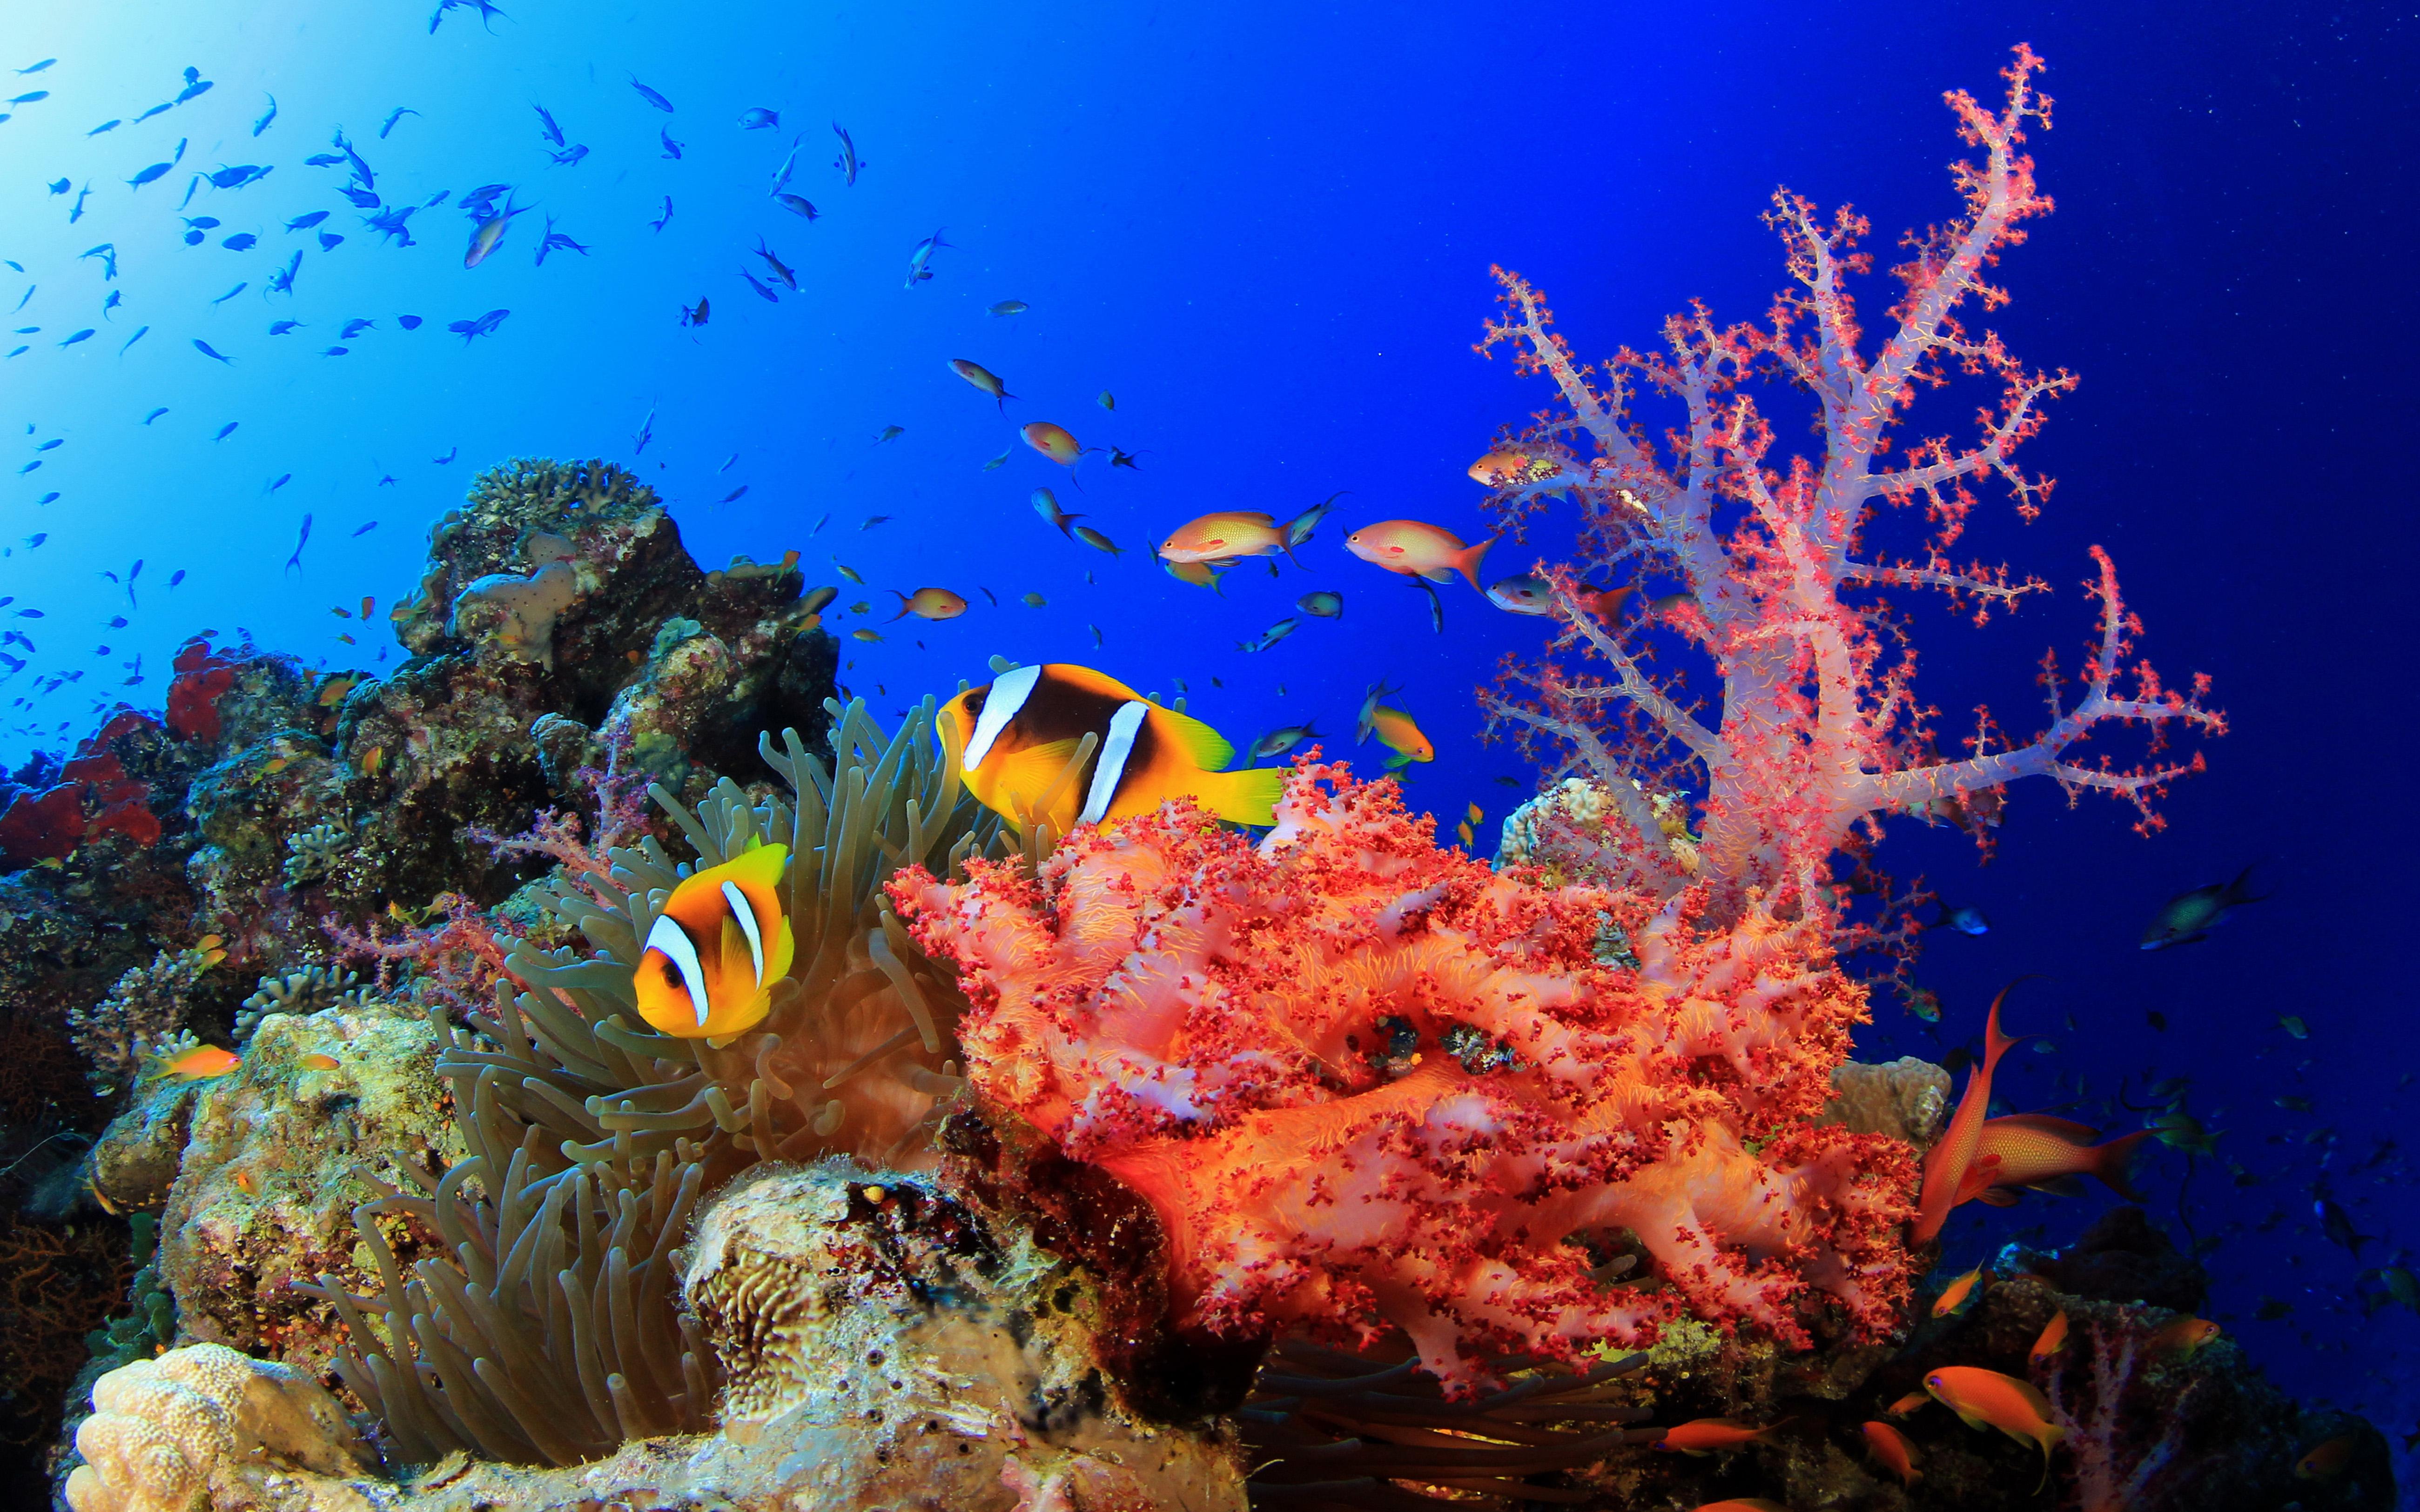 Sea Turtle Iphone Wallpaper Underwater World Okean Corals Tropical Colorful Fish Hd